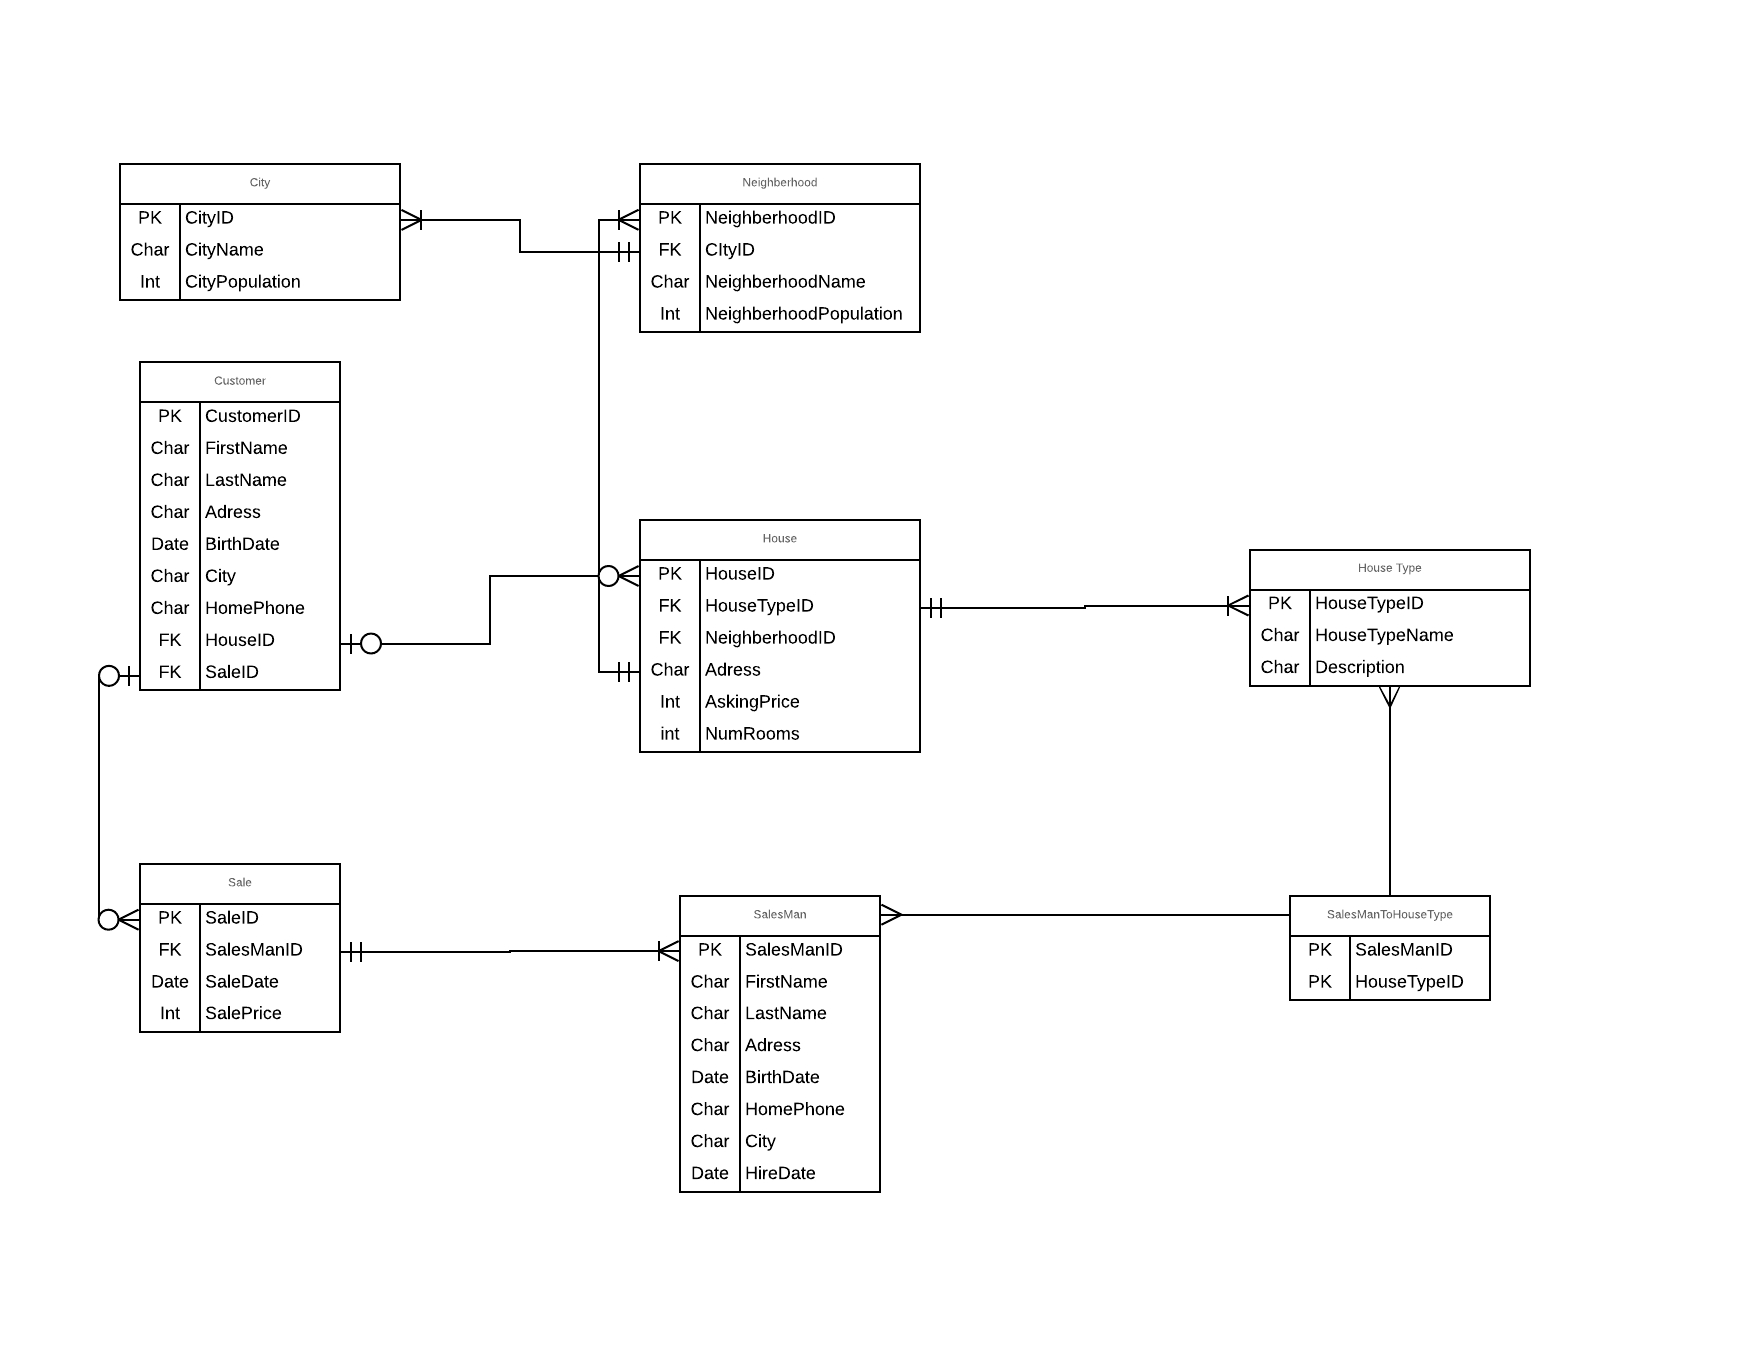 Creating Erd And Sql Tables Based On The Erd - Stack Overflow regarding Er Diagram W3Schools